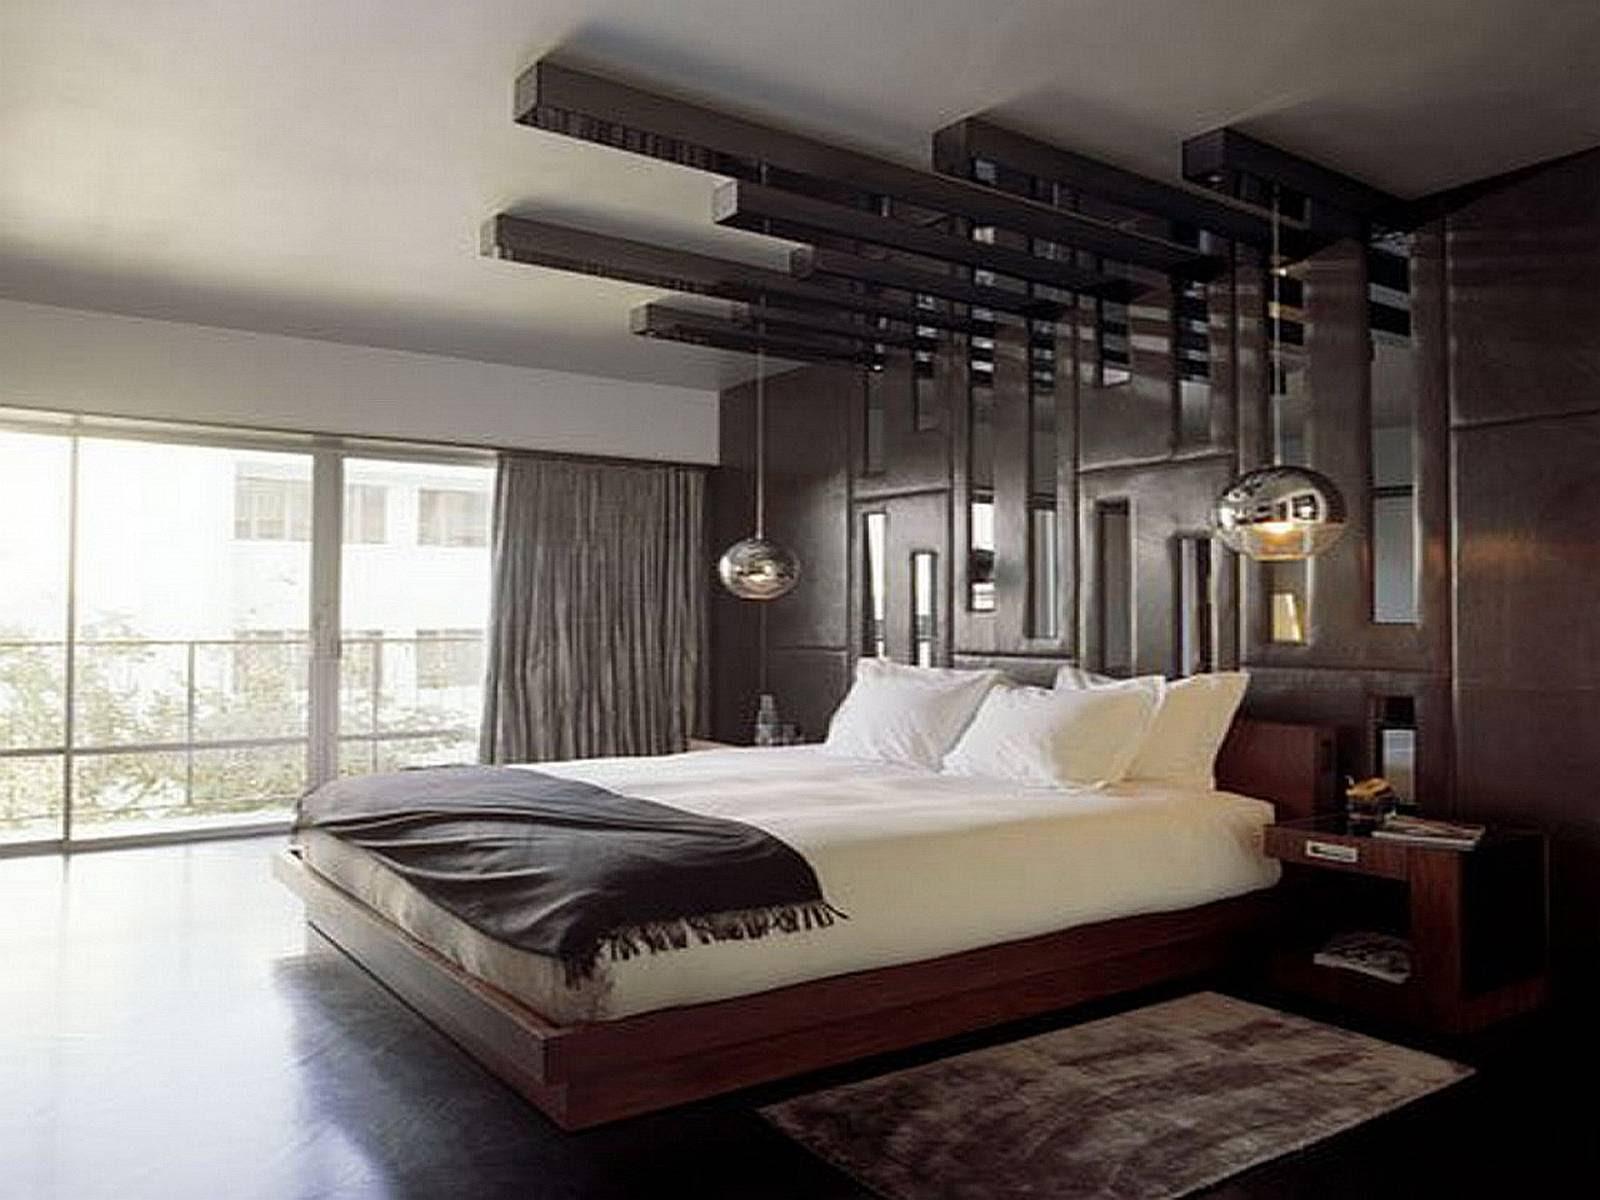 Some brilliant ideas of bedroom designs - Homedizz